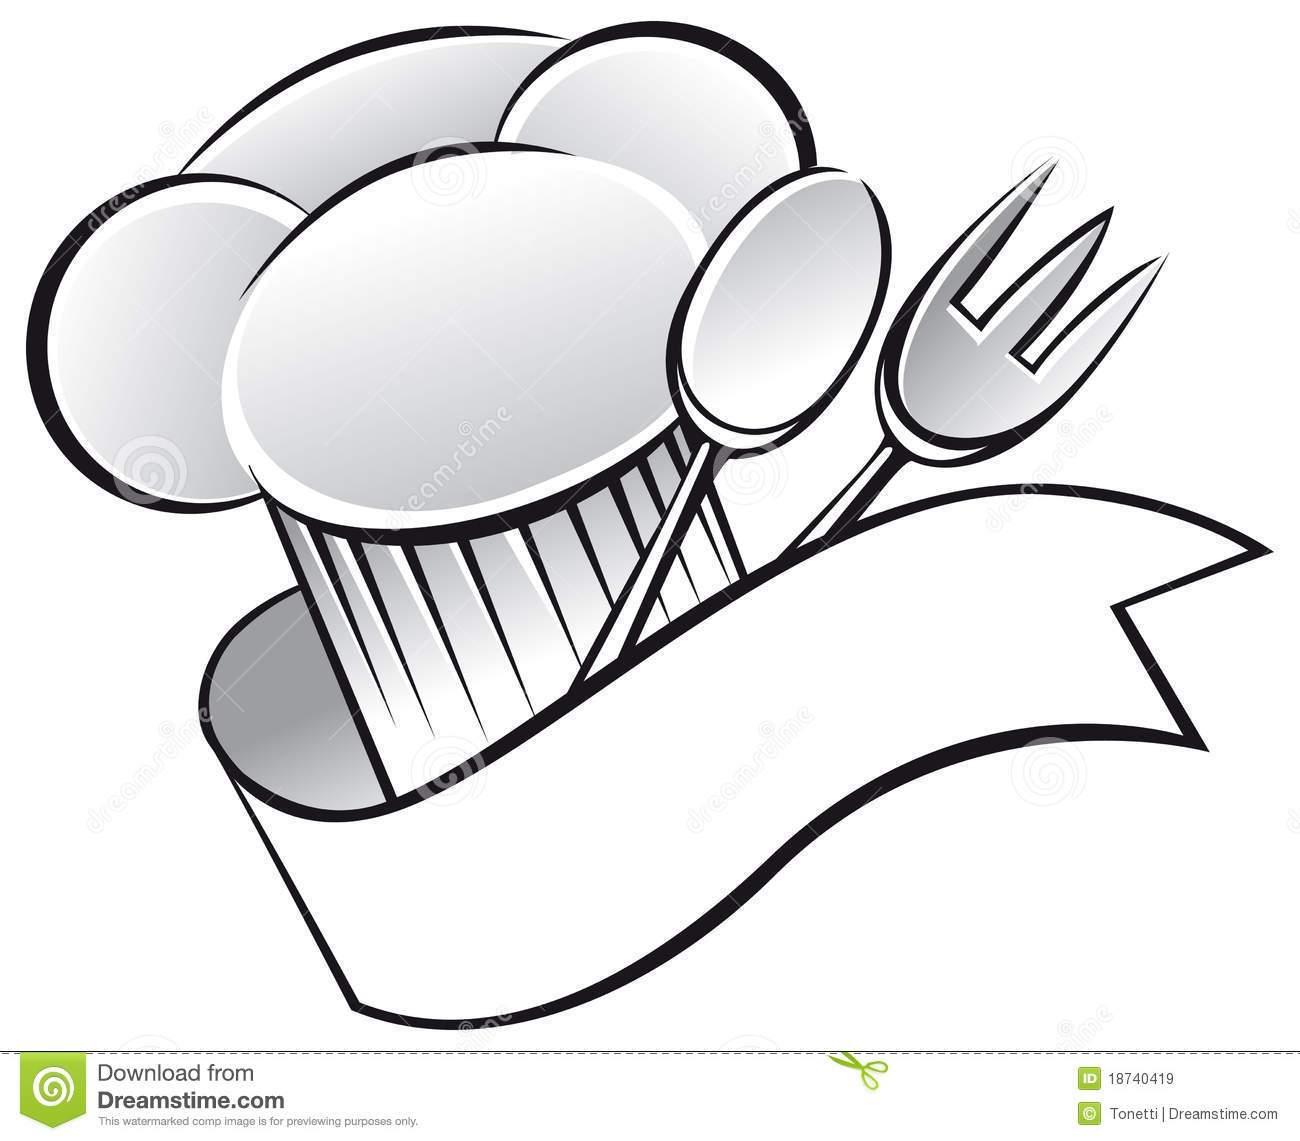 Chef utensils clipart » Clipart Portal.